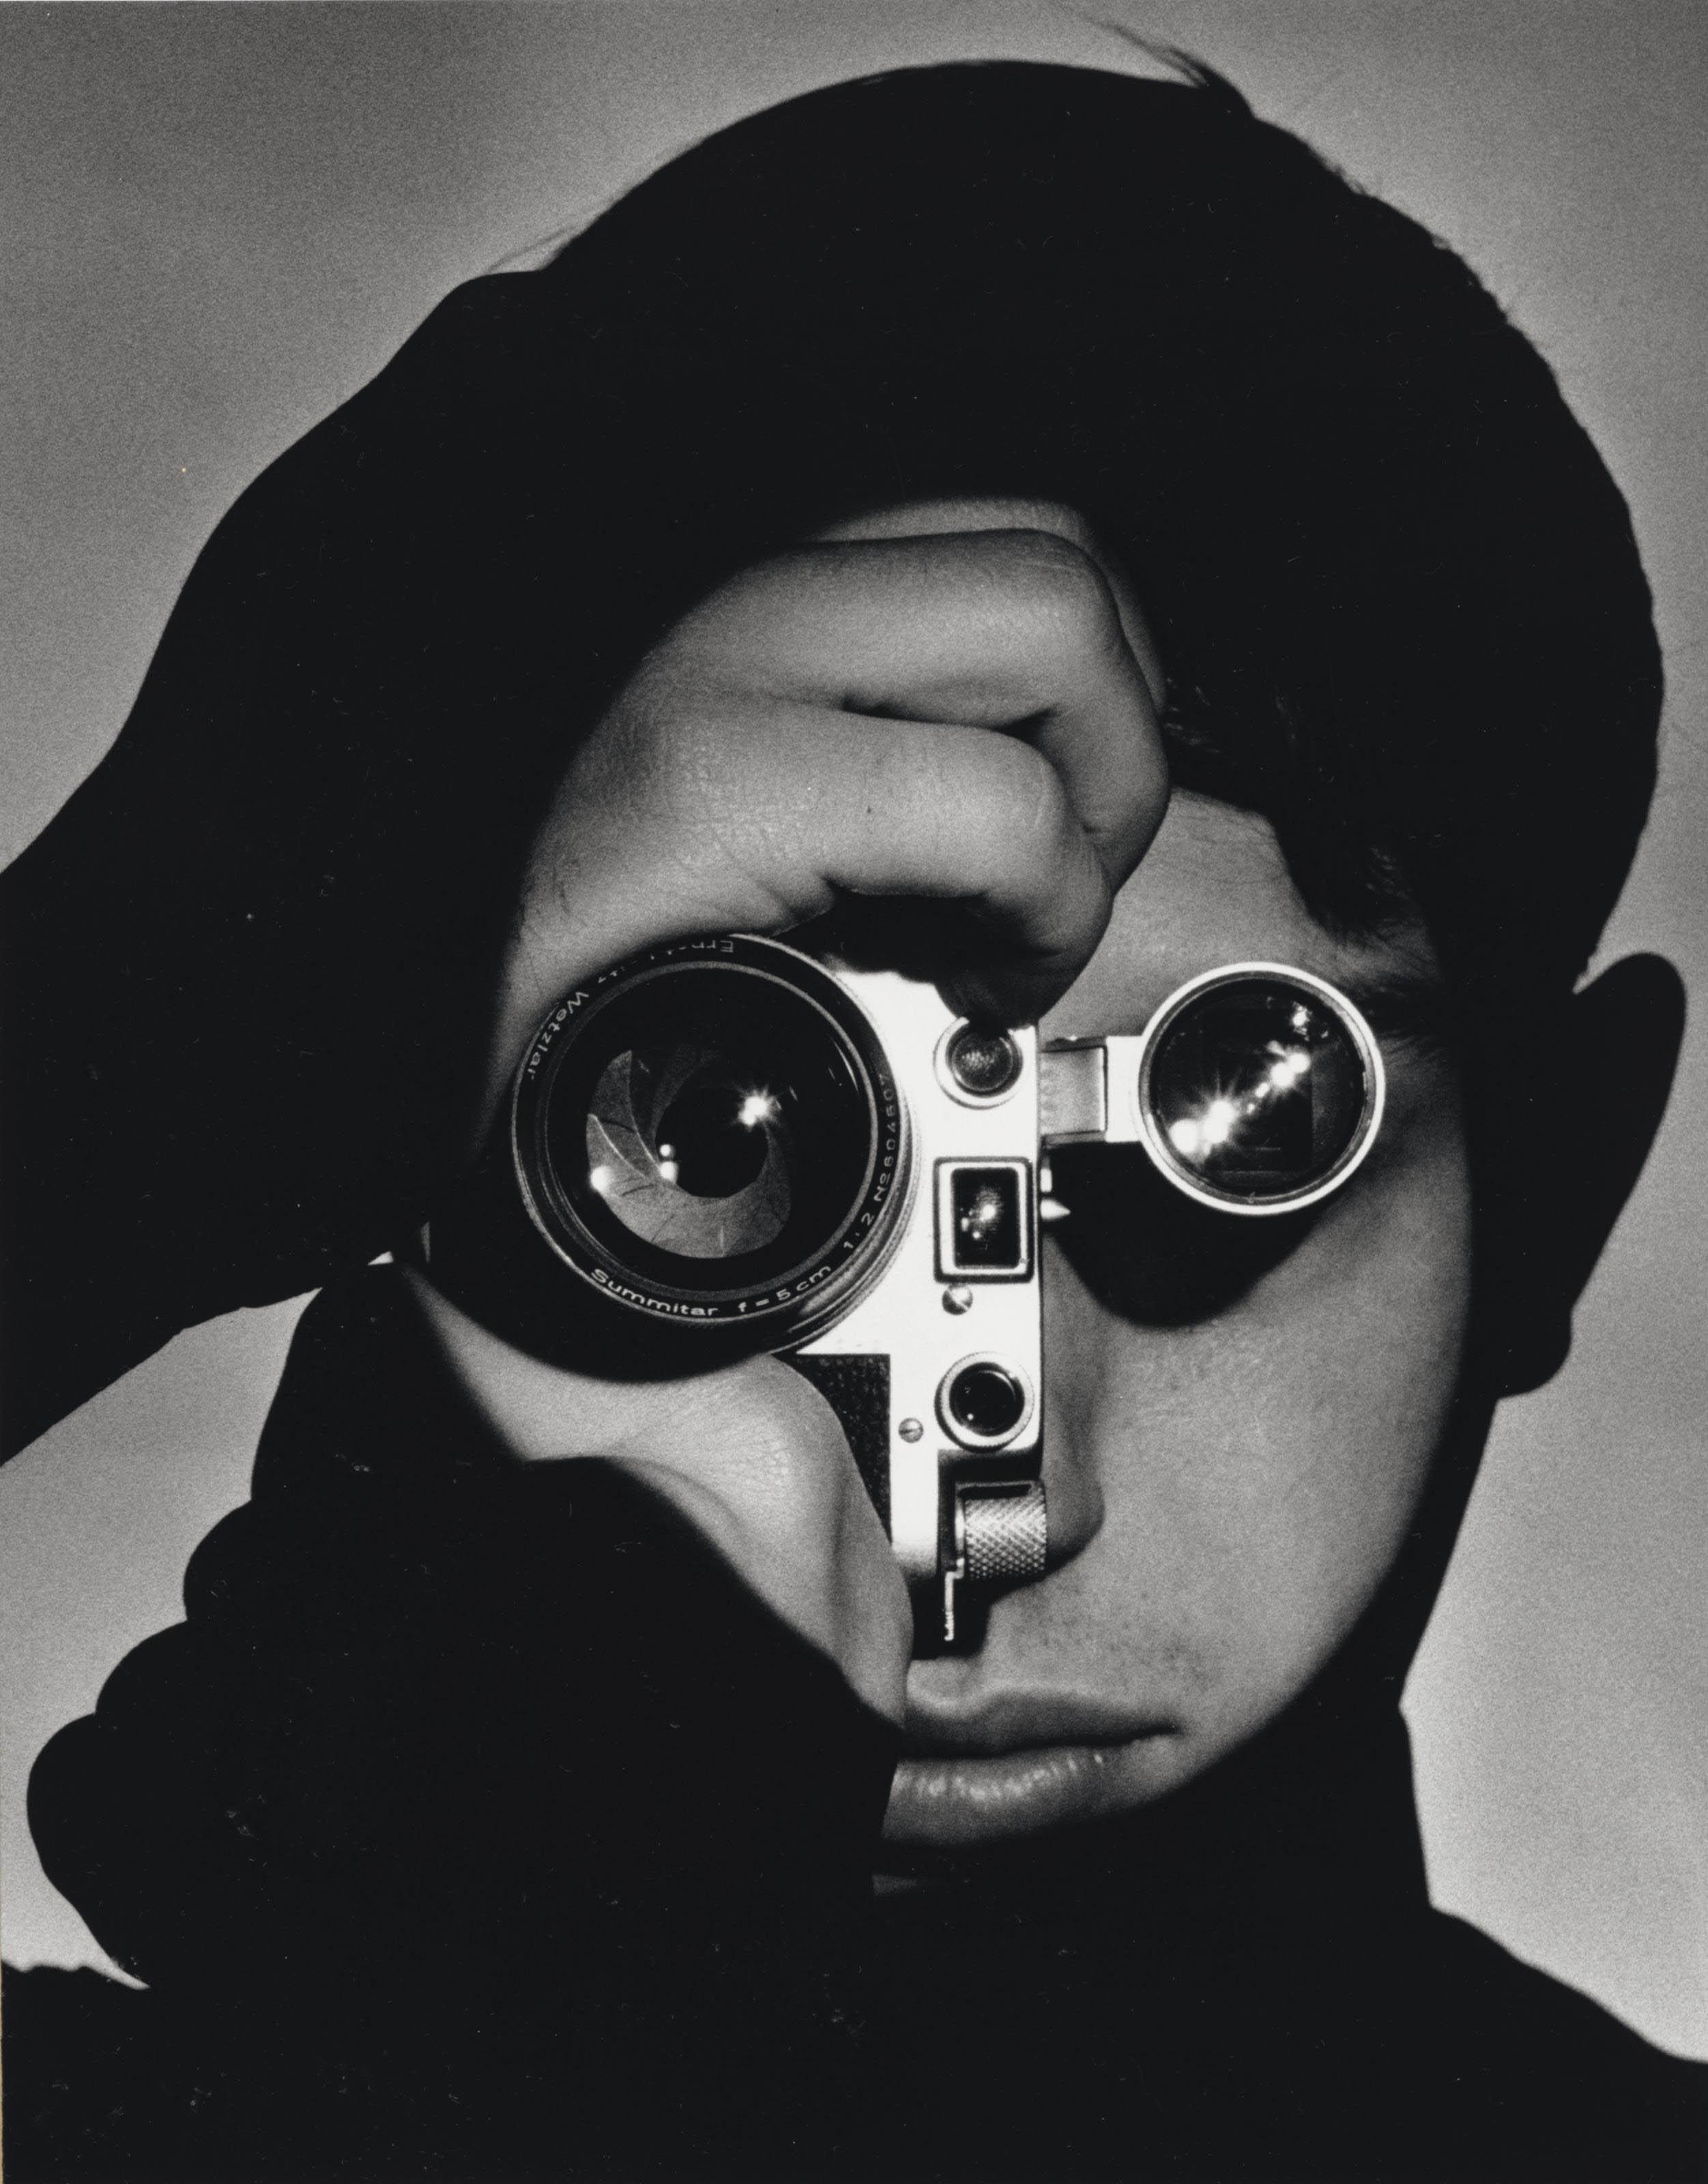 The Photojournalist, 1951